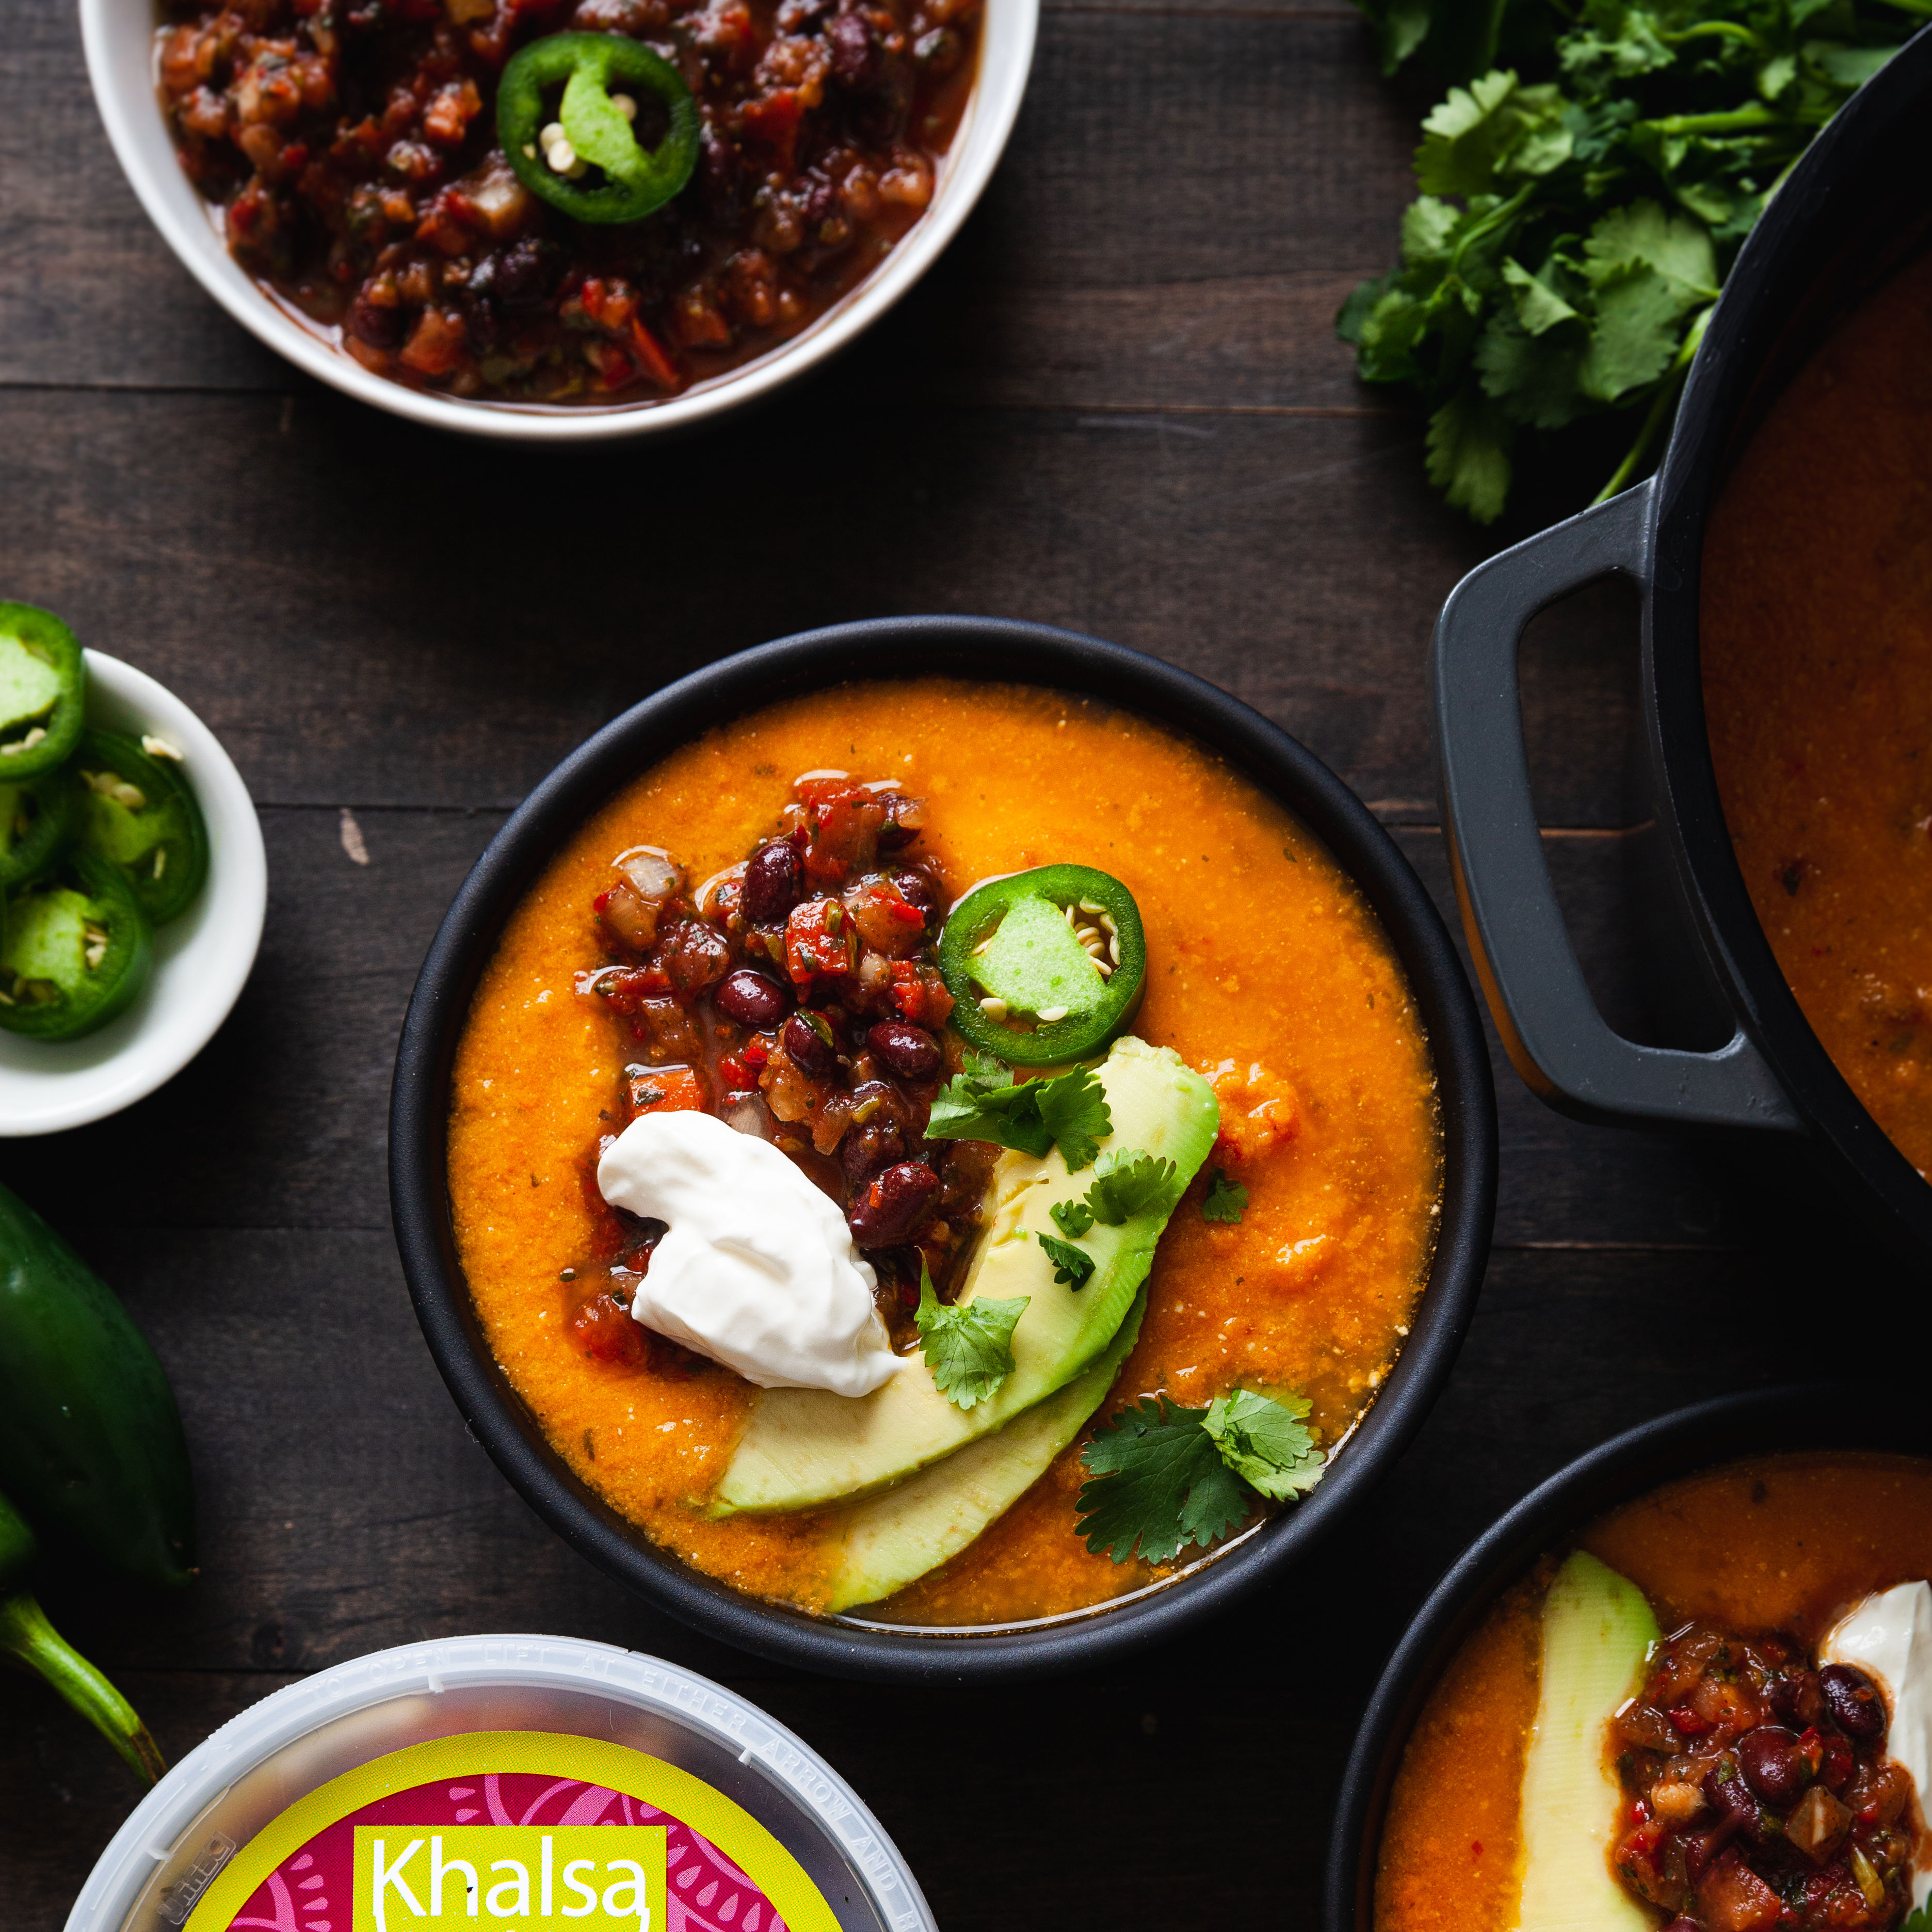 Make Khalsa Salsa's Sweet Potato Soup with Black Bean Salsa